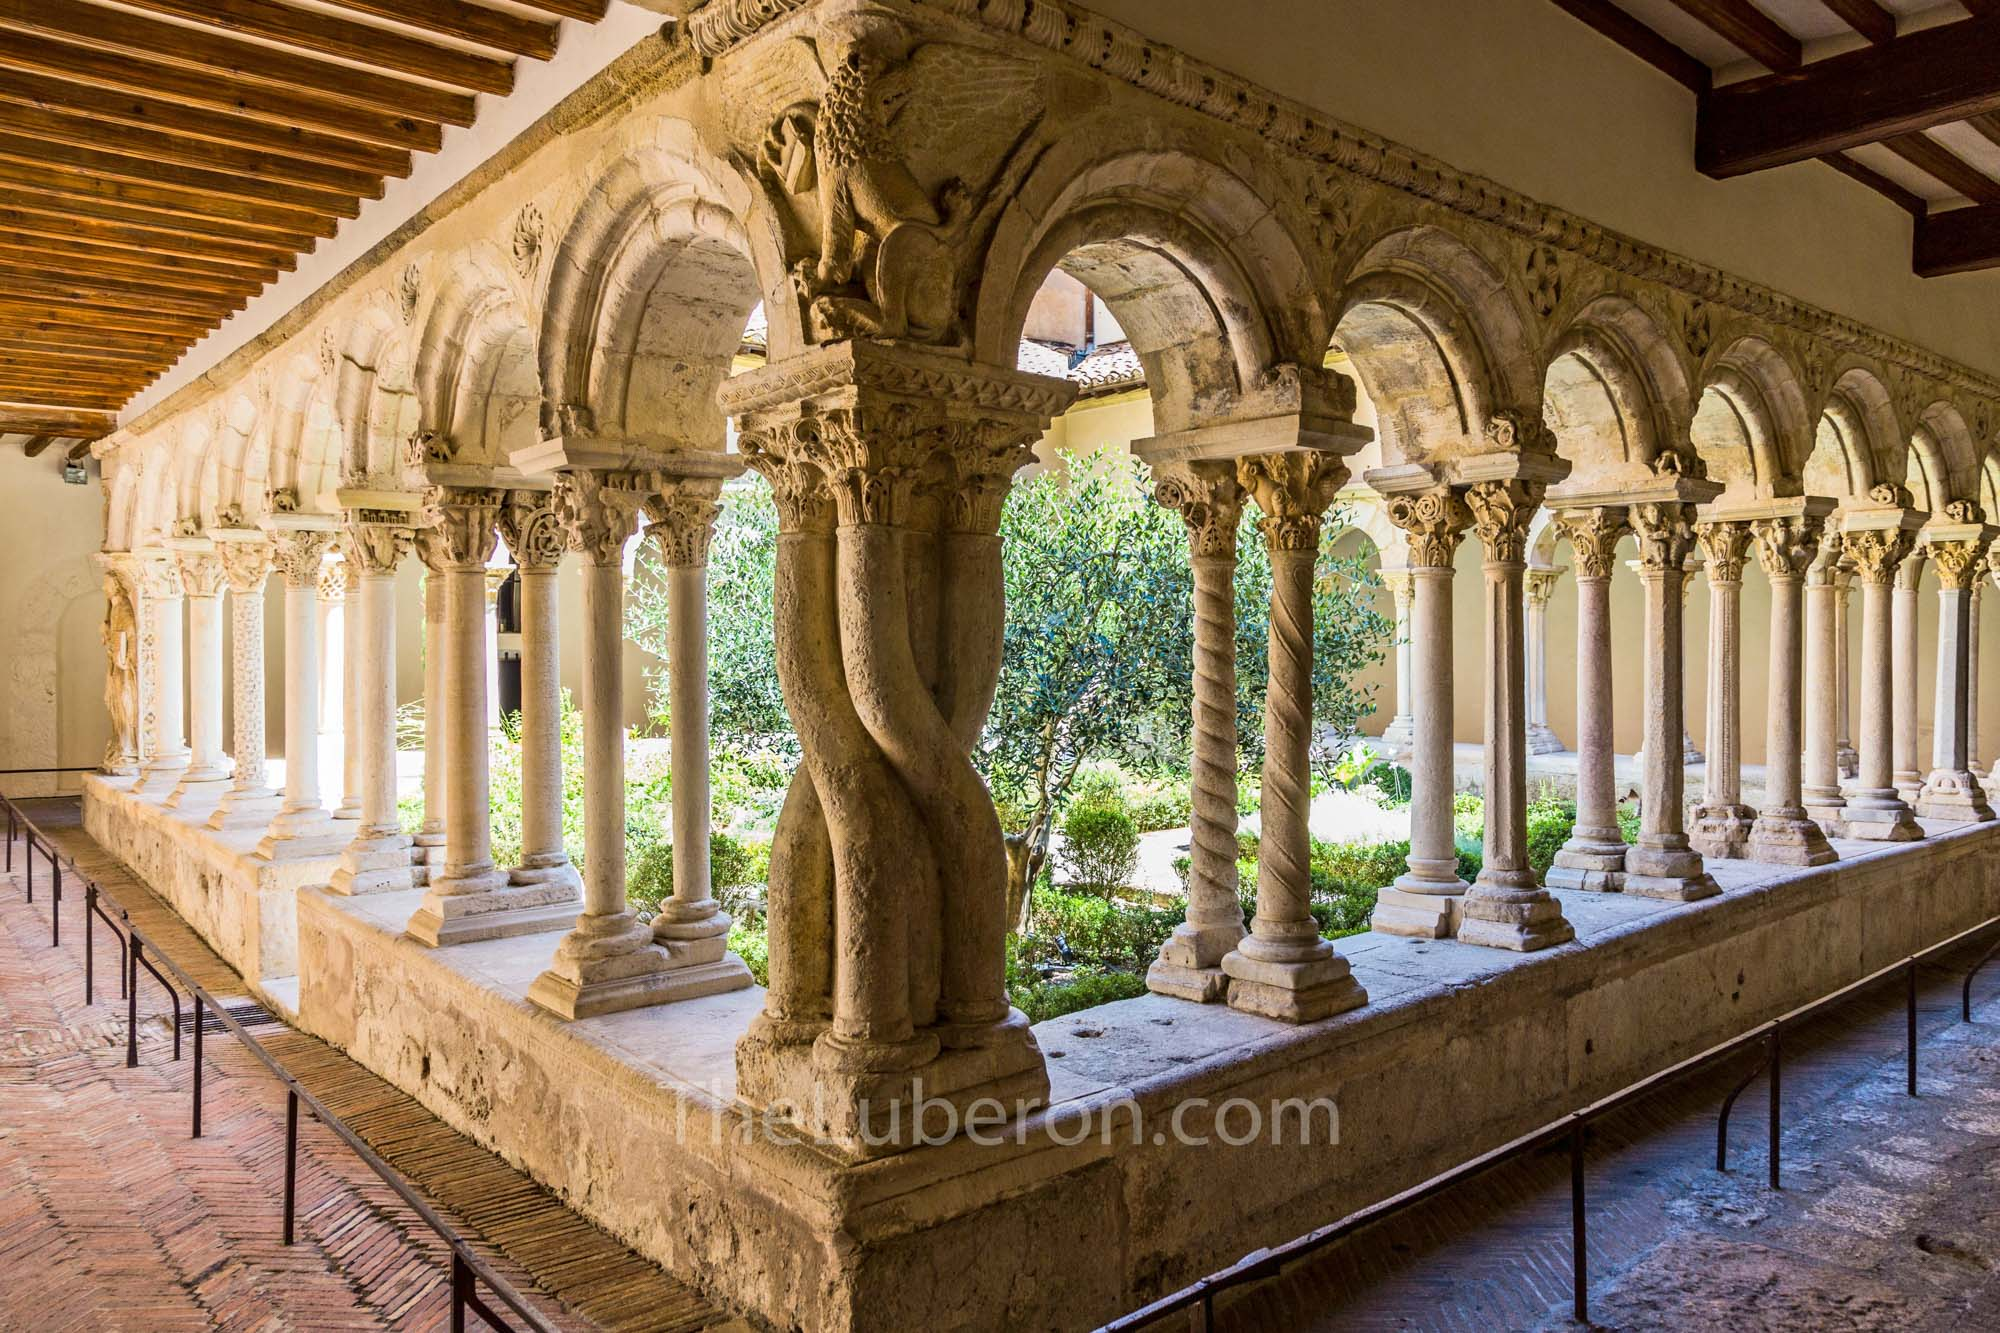 Cloister garden in Aix